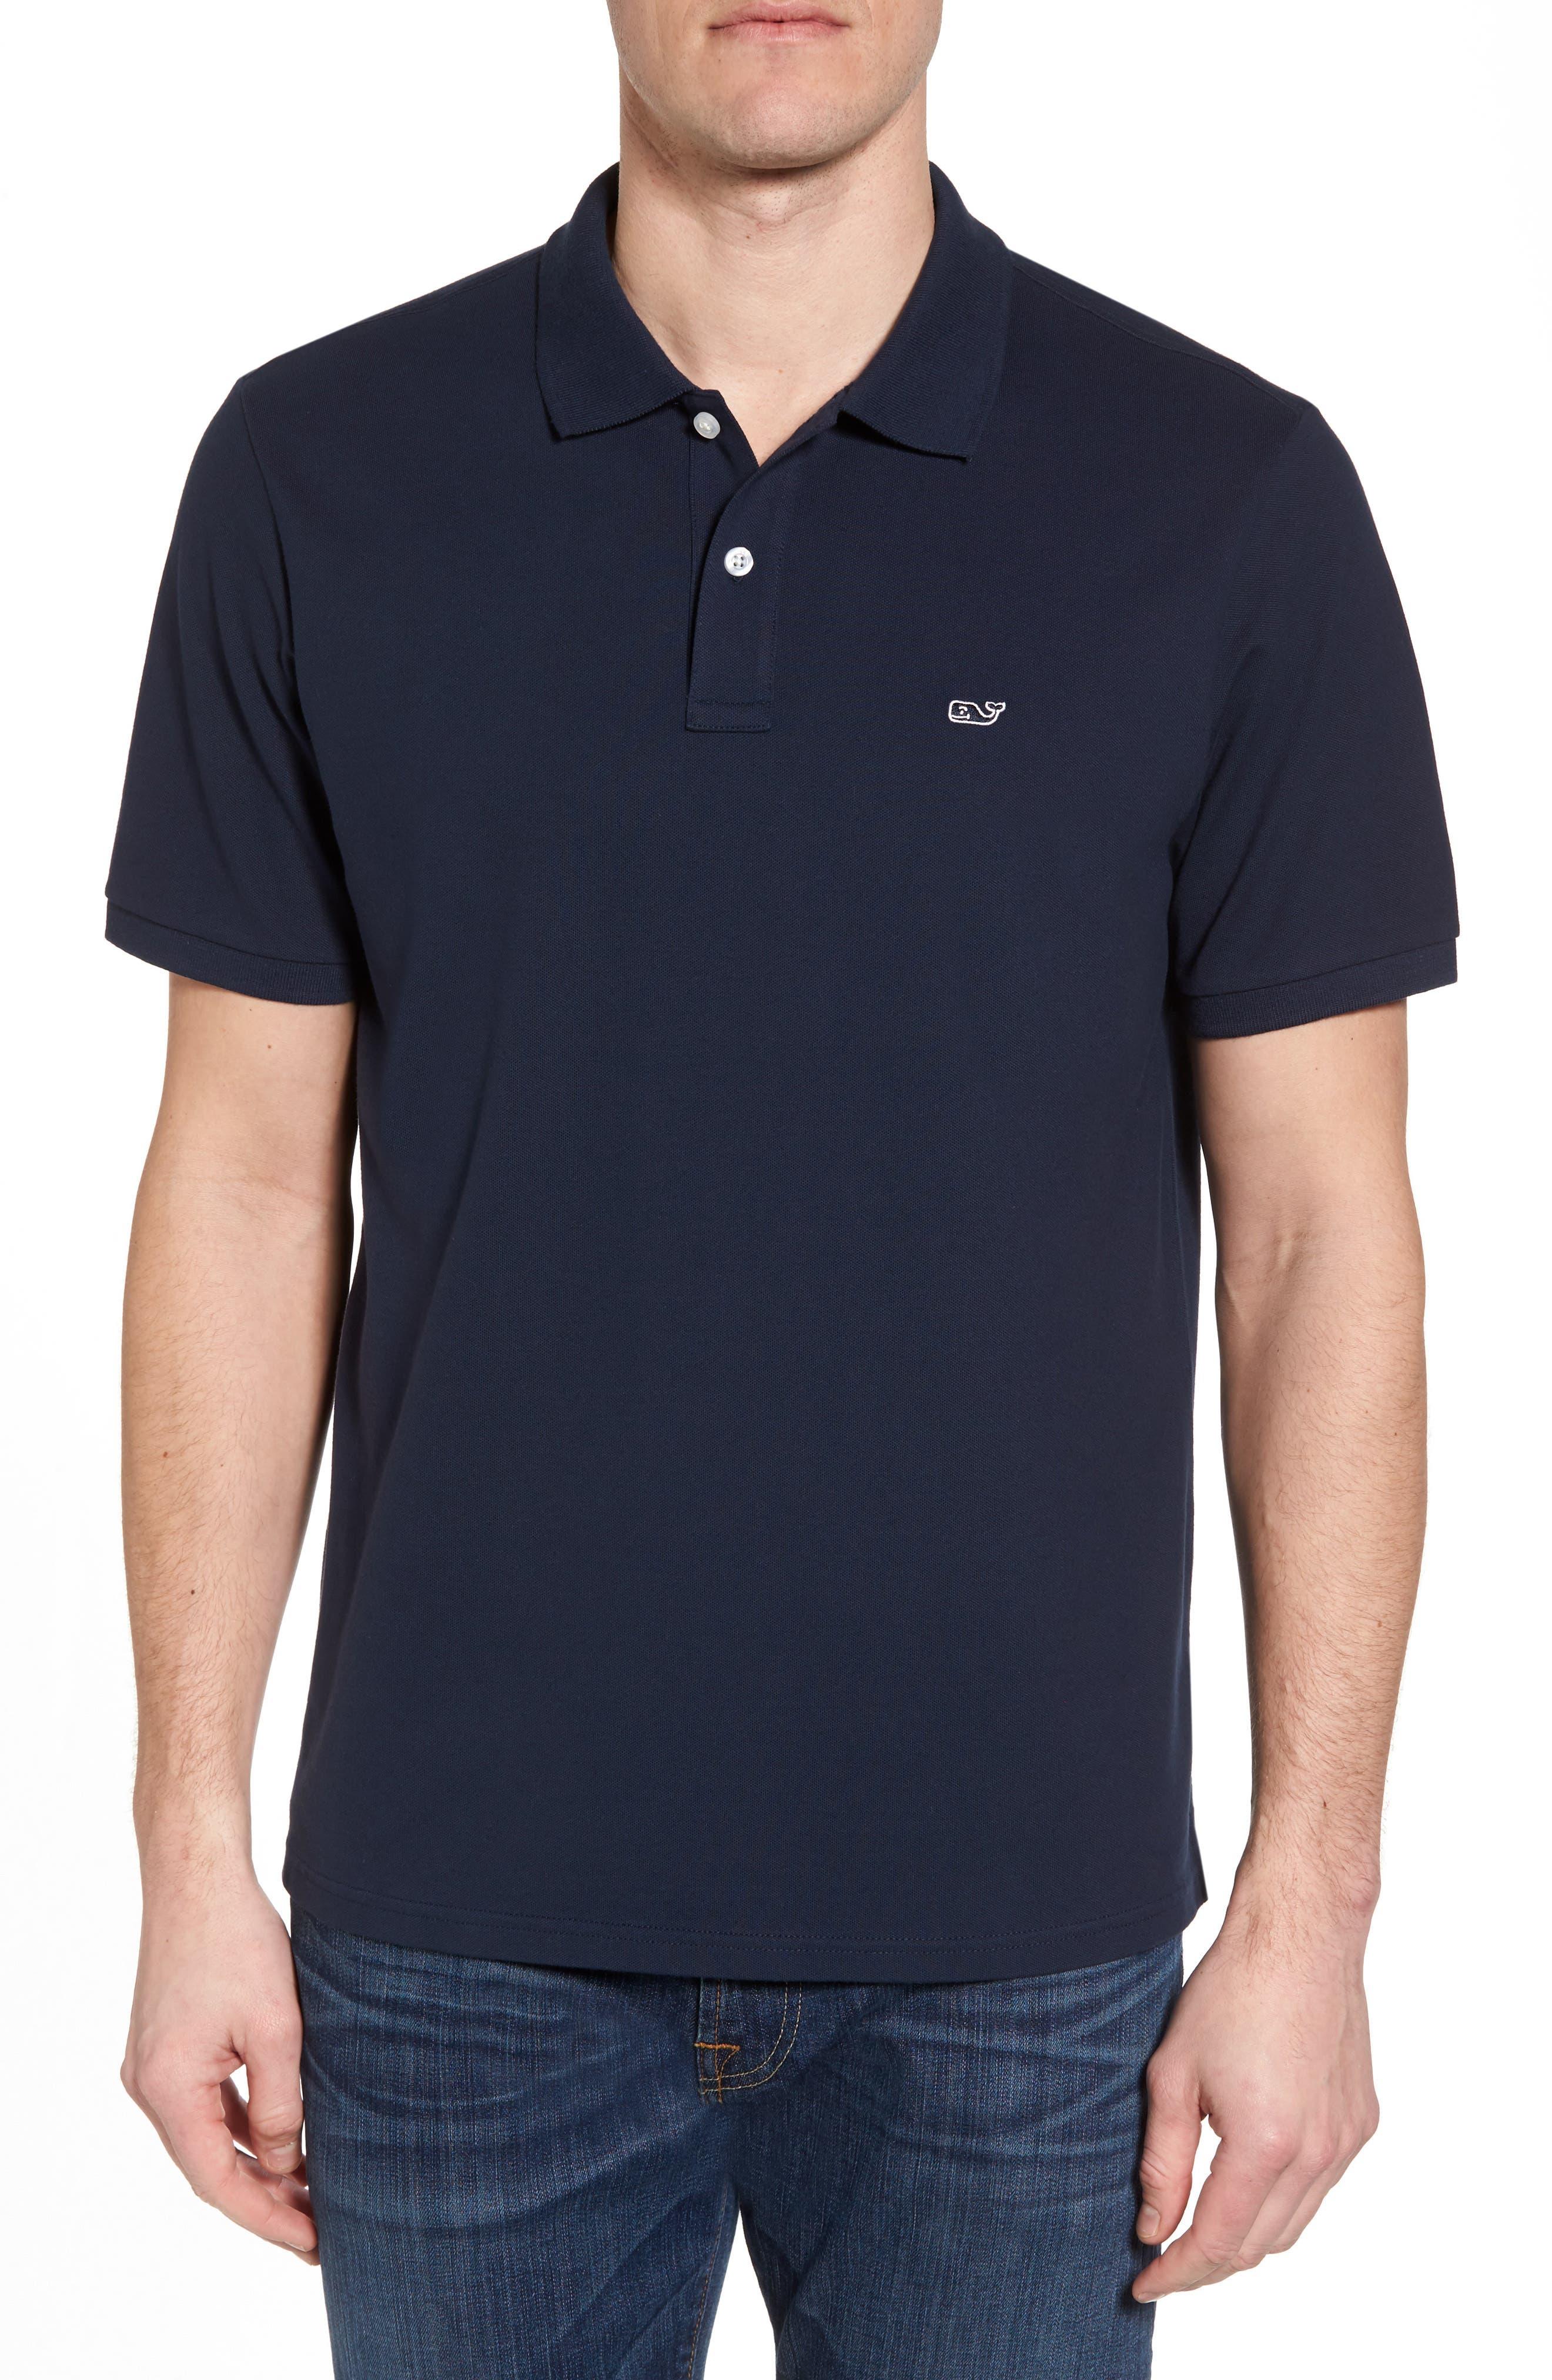 Vineyard Vines Pique Regular Fit Polo Shirt In Navy Modesens